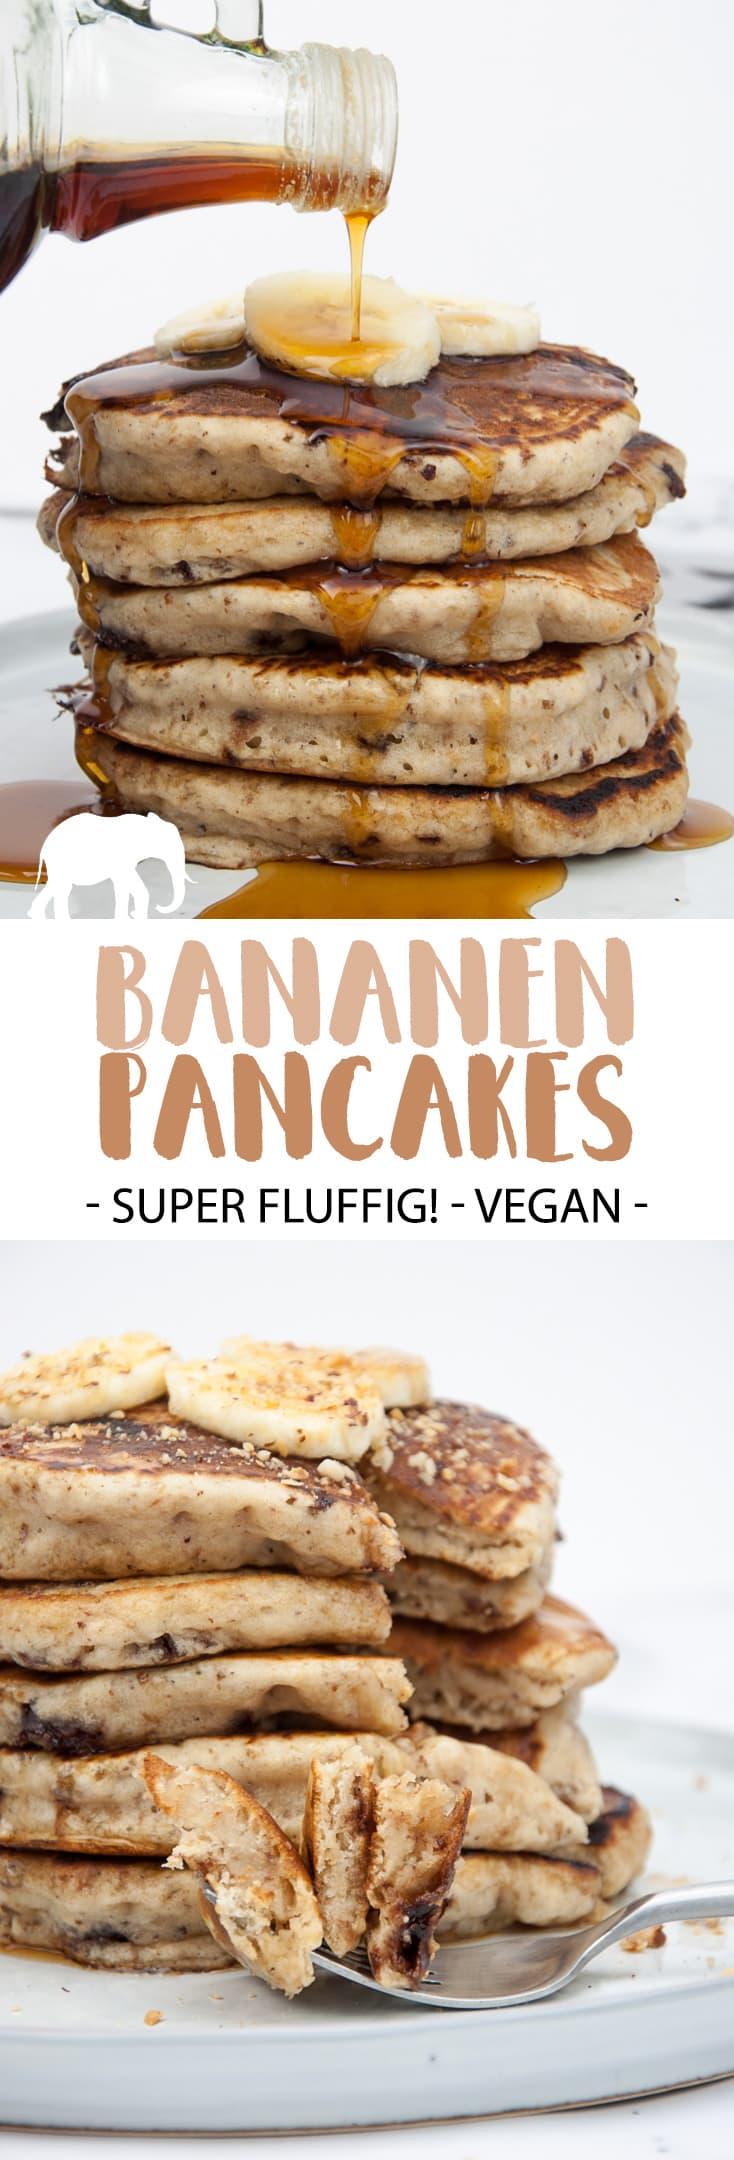 Fluffige Bananen-Pancakes mit Schokostückchen (Vegan)  ElephantasticVegan.de #vegan #pancakes #pfannkuchen #bananen